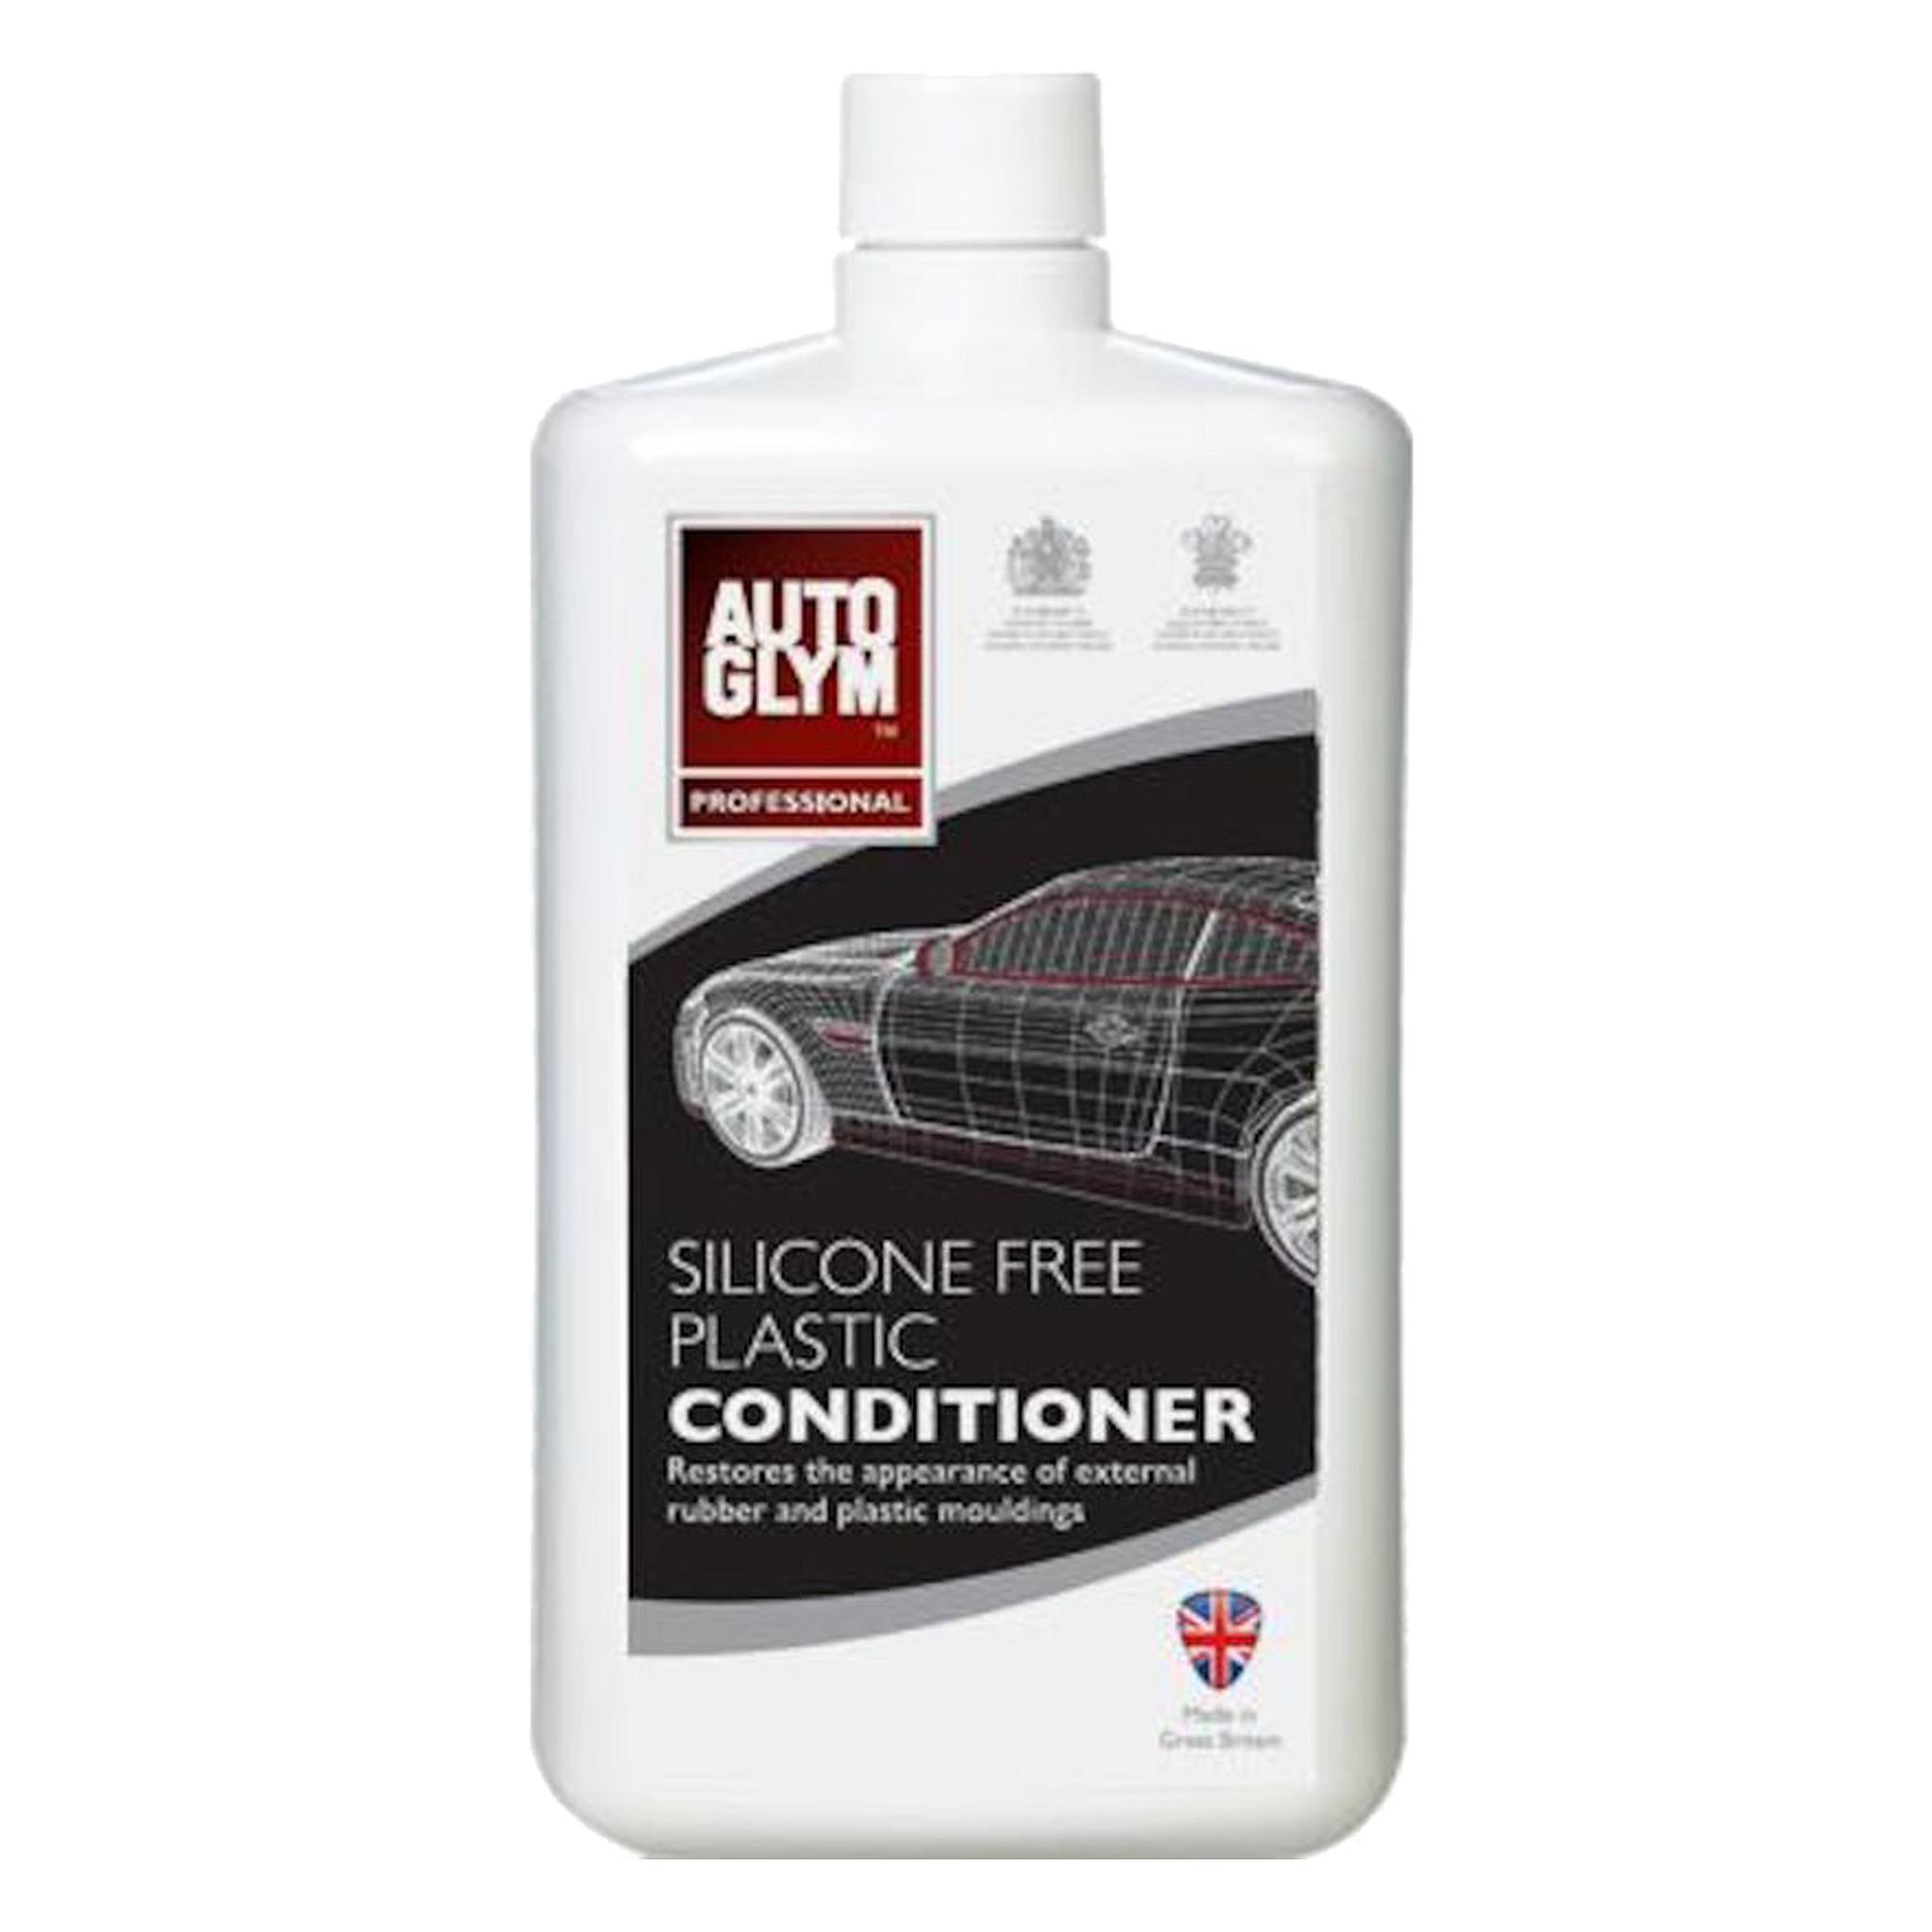 Afbeelding van Autoglym Silicone free plastic conditioner